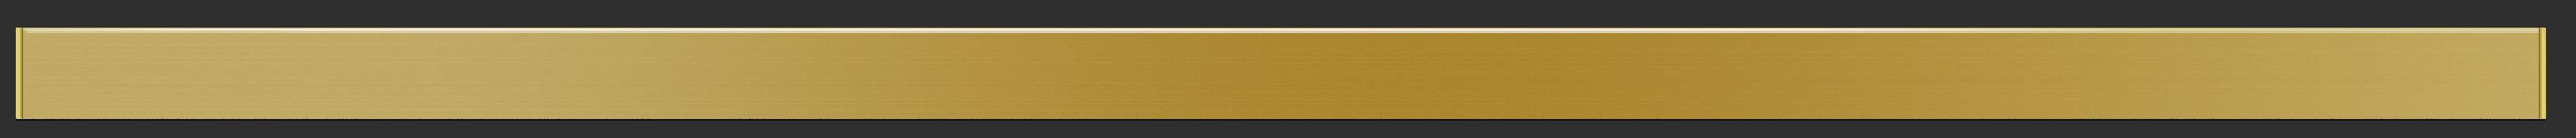 Bedtime White Blackout Roller Blinds With Gold Bottom Bar Flat Closeup